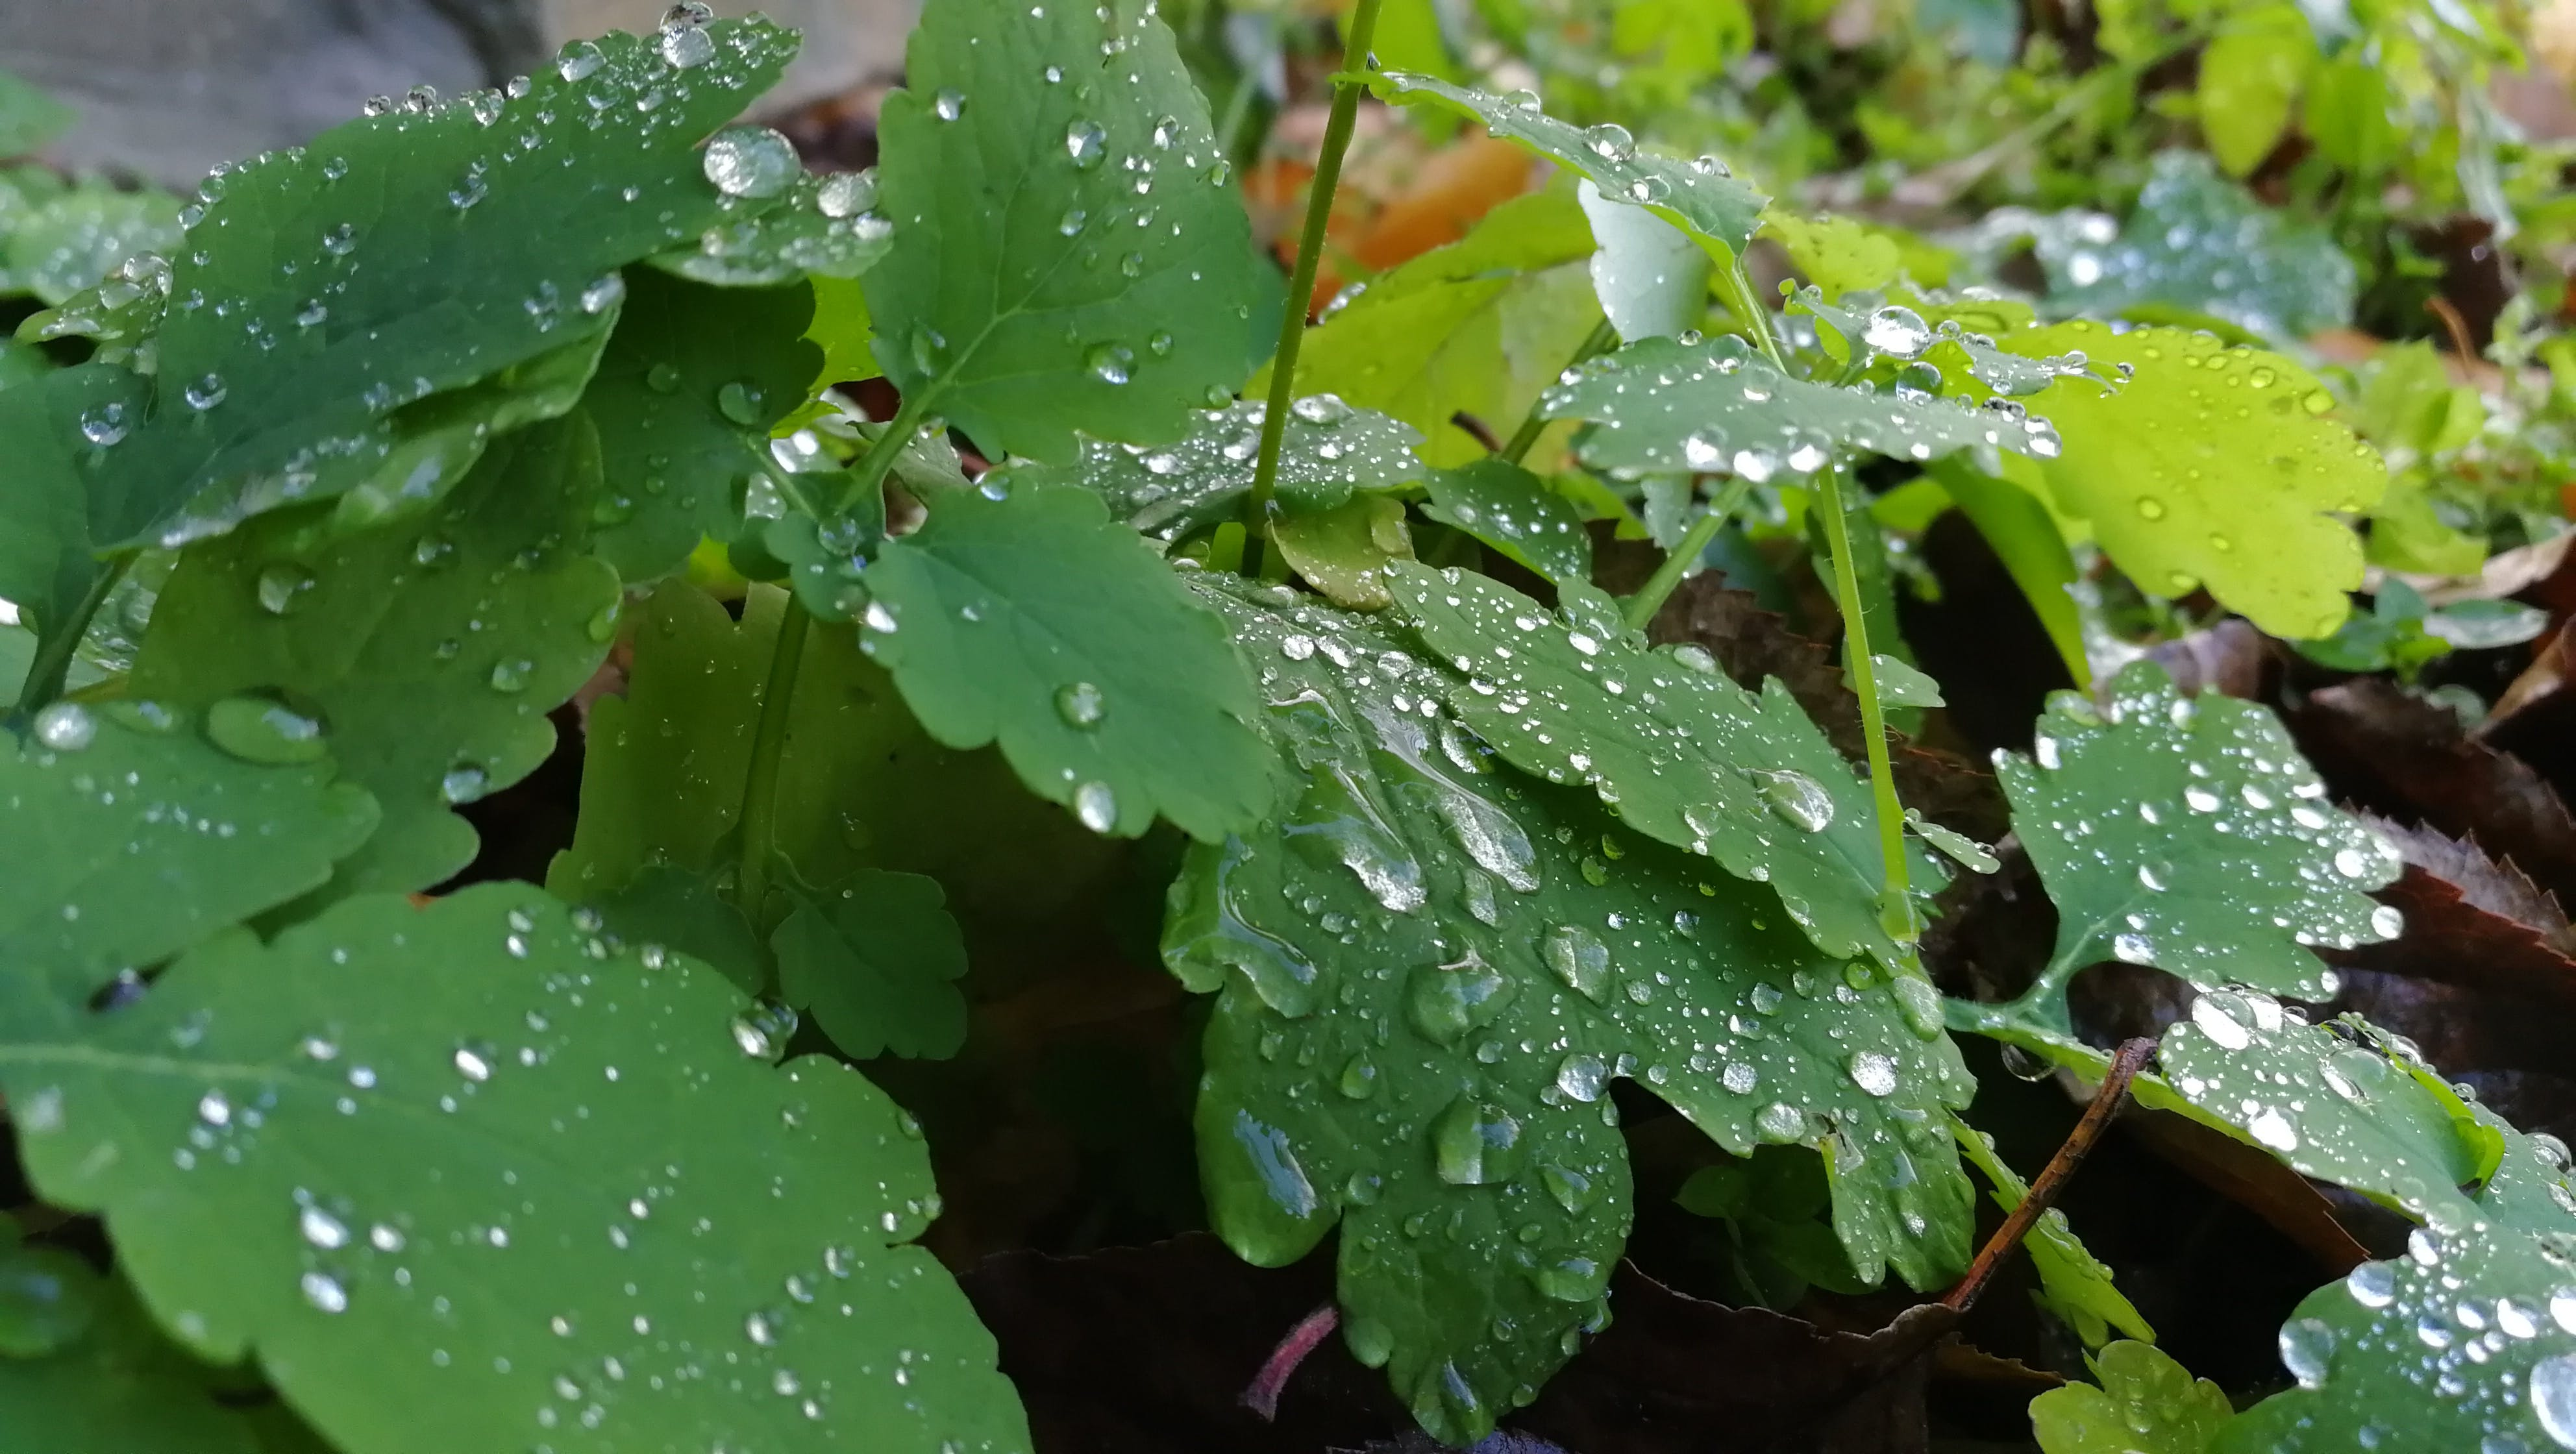 Free stock photo of natue